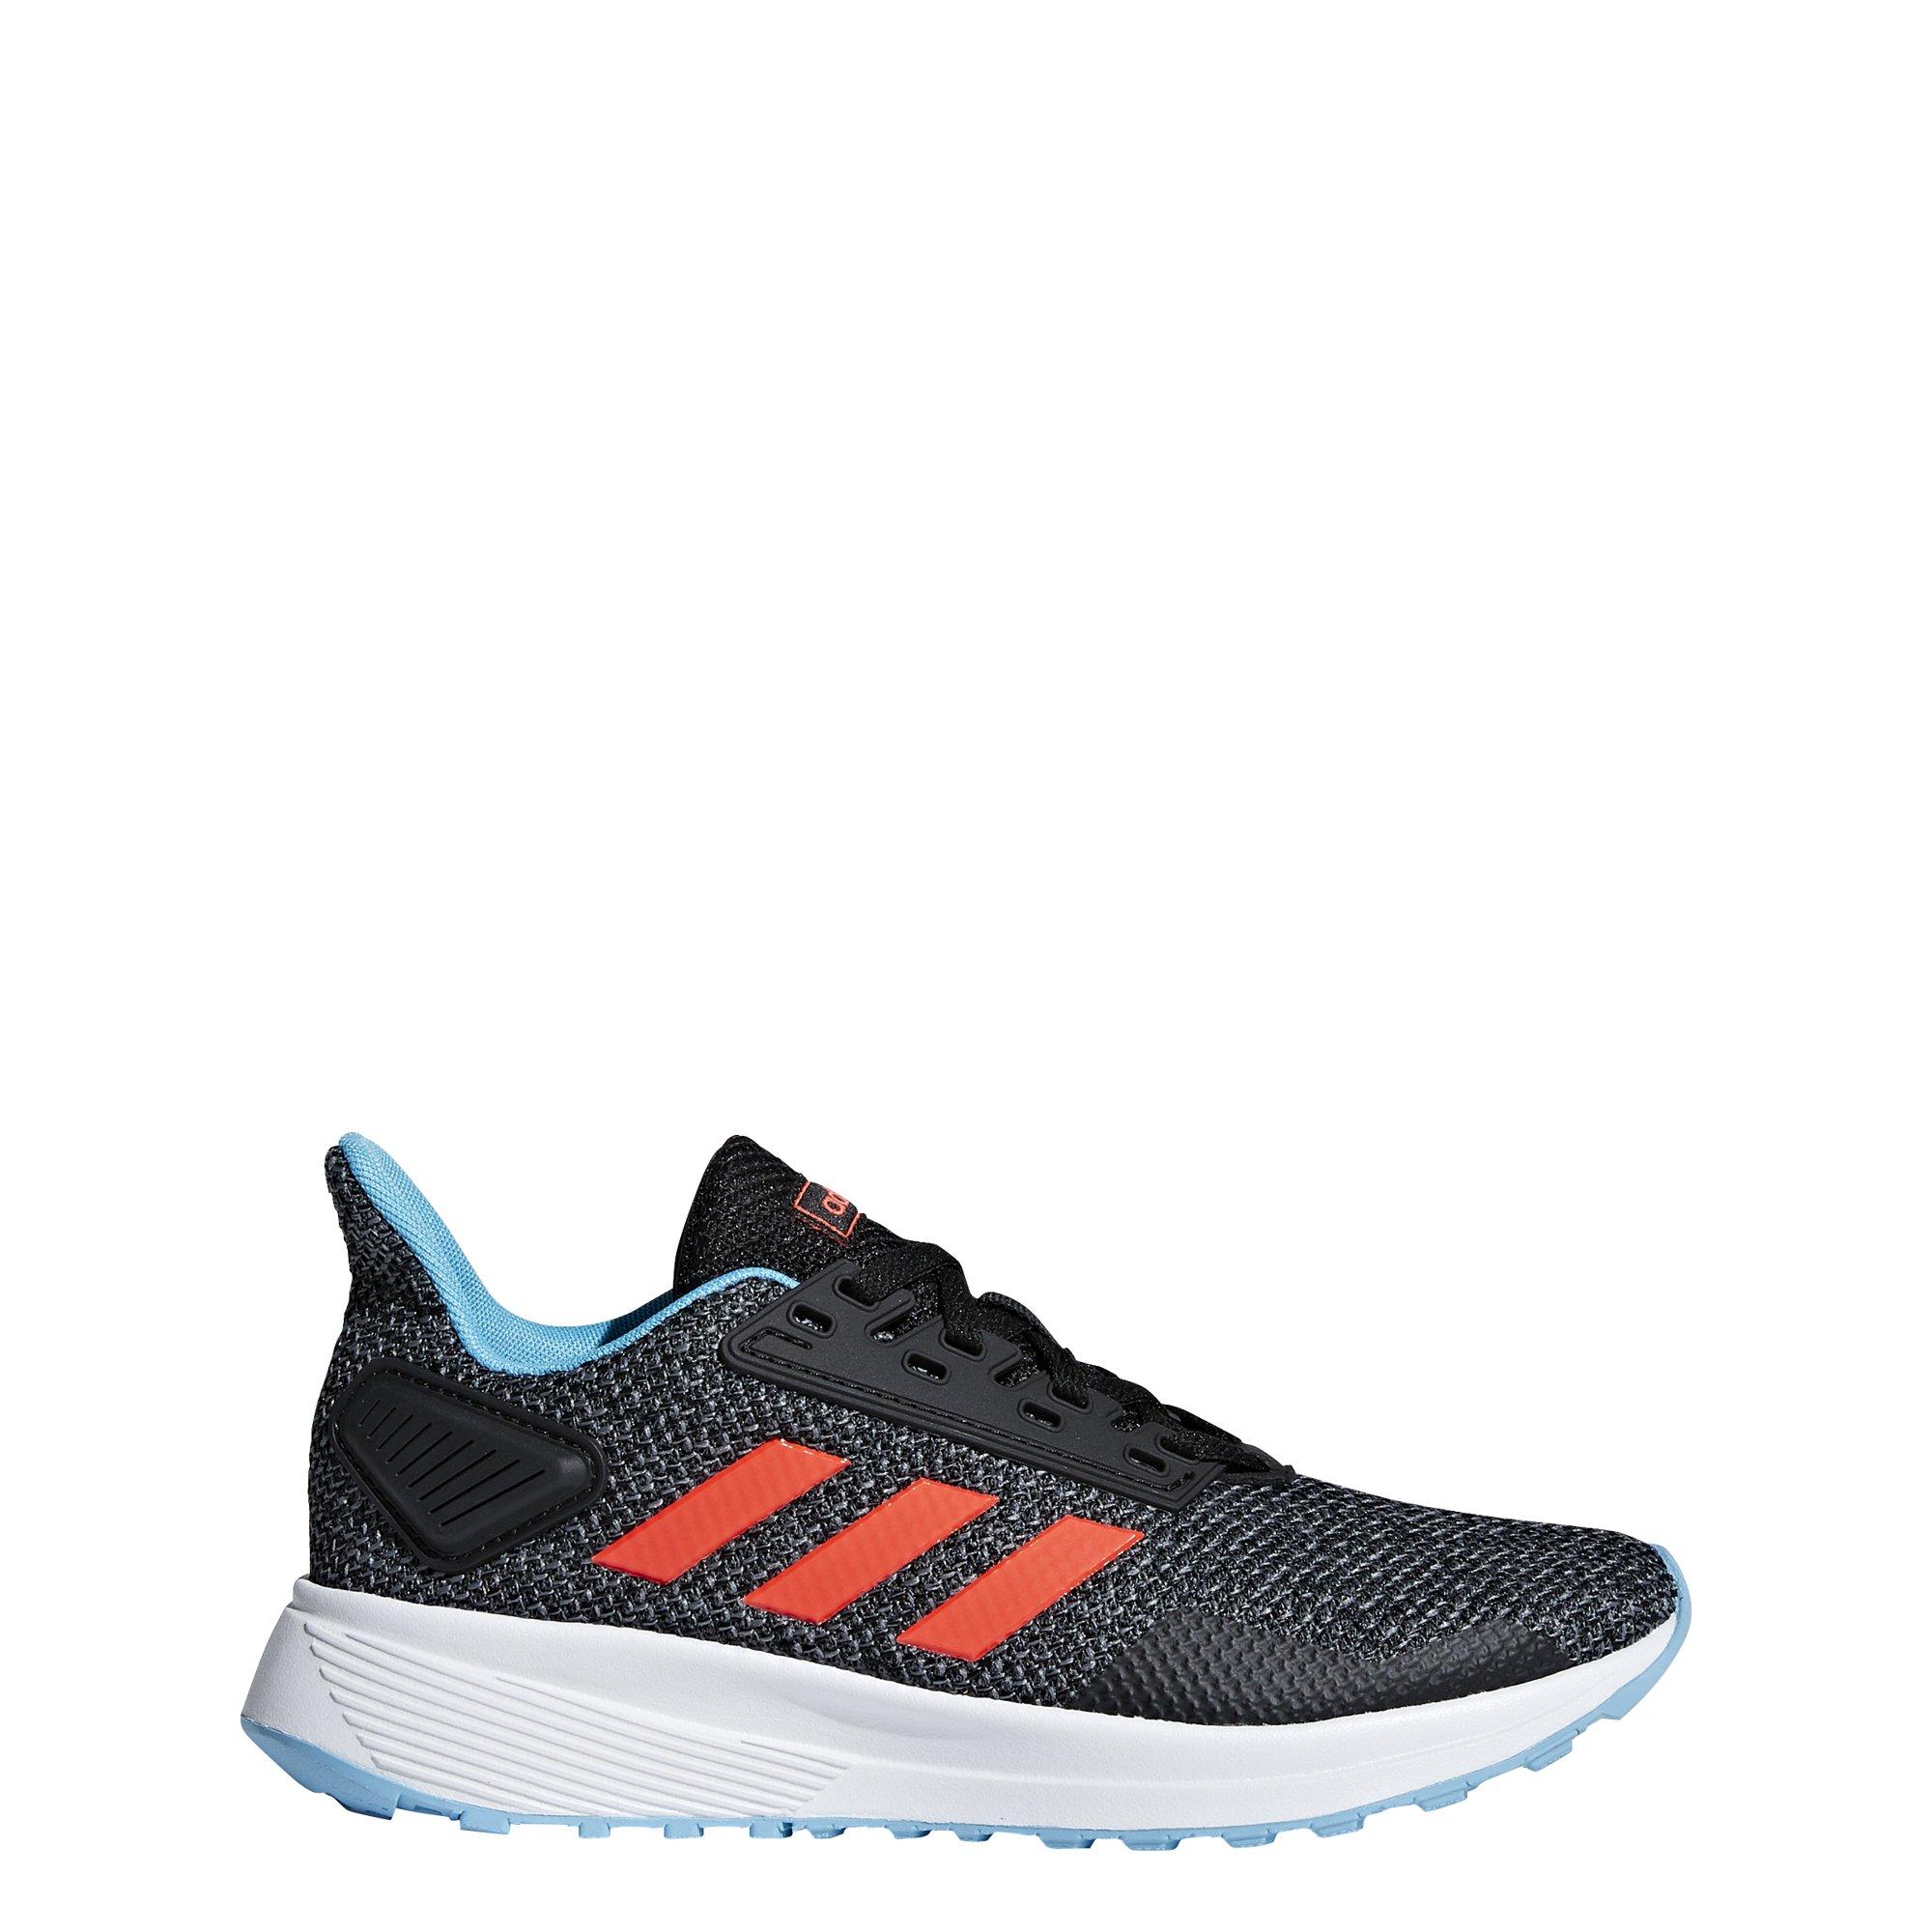 adidas Performance Unisex-Kids Duramo 9 Running Shoe, Black/Solar Red/Grey, 1 M US Little Kid